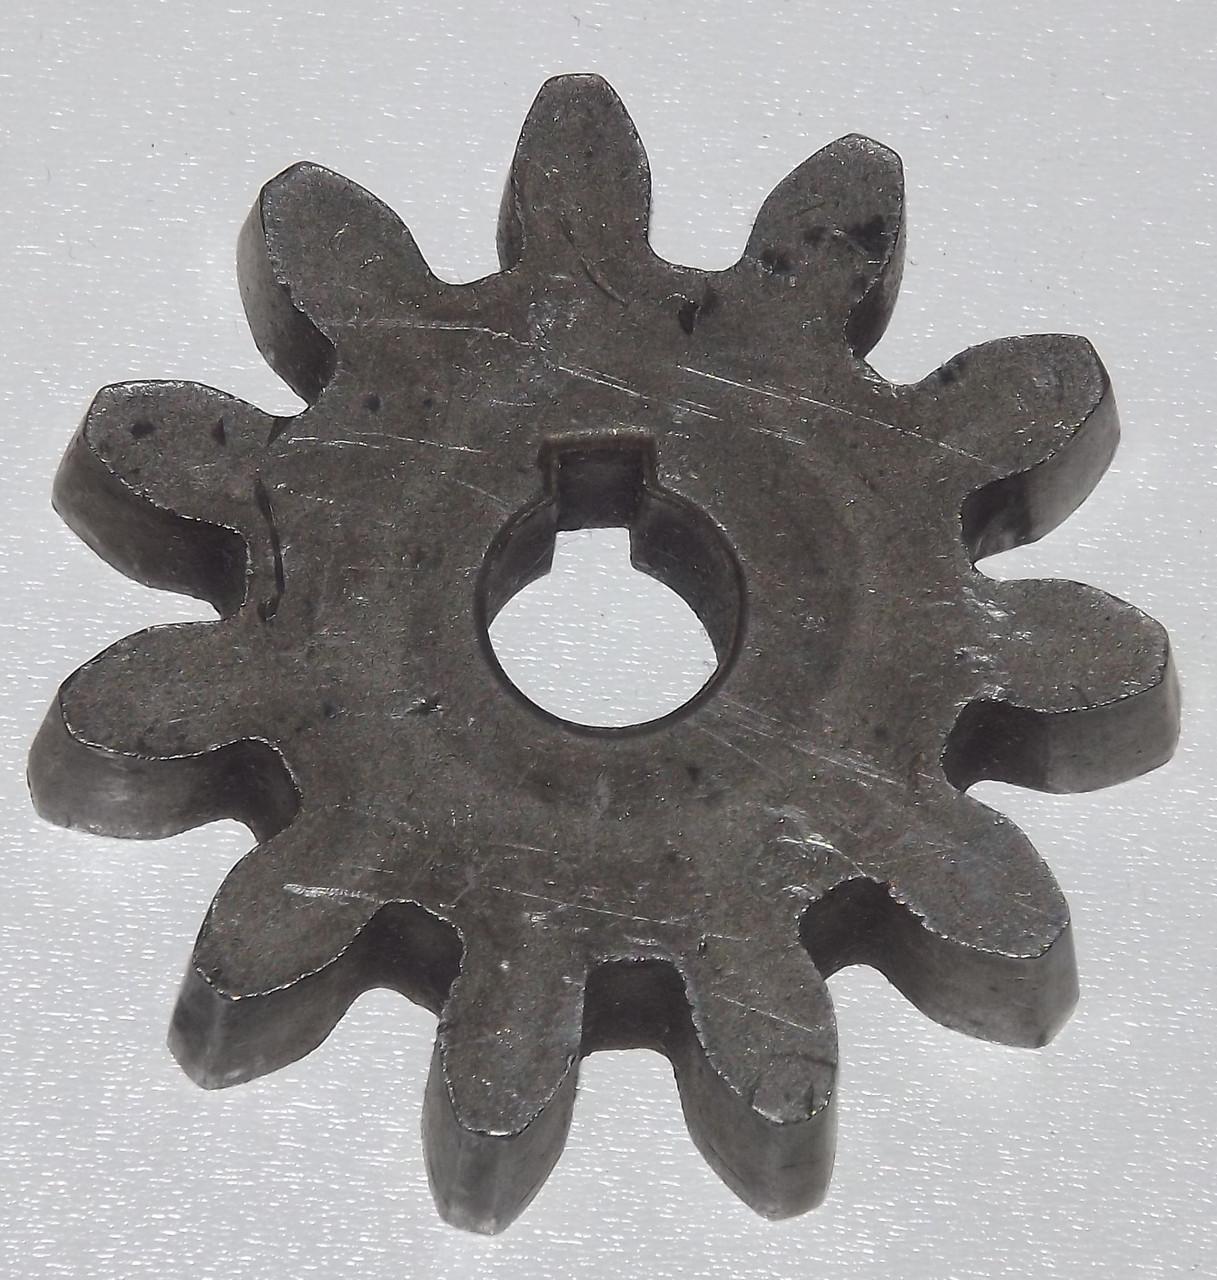 Шестеренка на  11 зубьев к бетономешалке Werk, Forte, 140, 160, 180 литров.